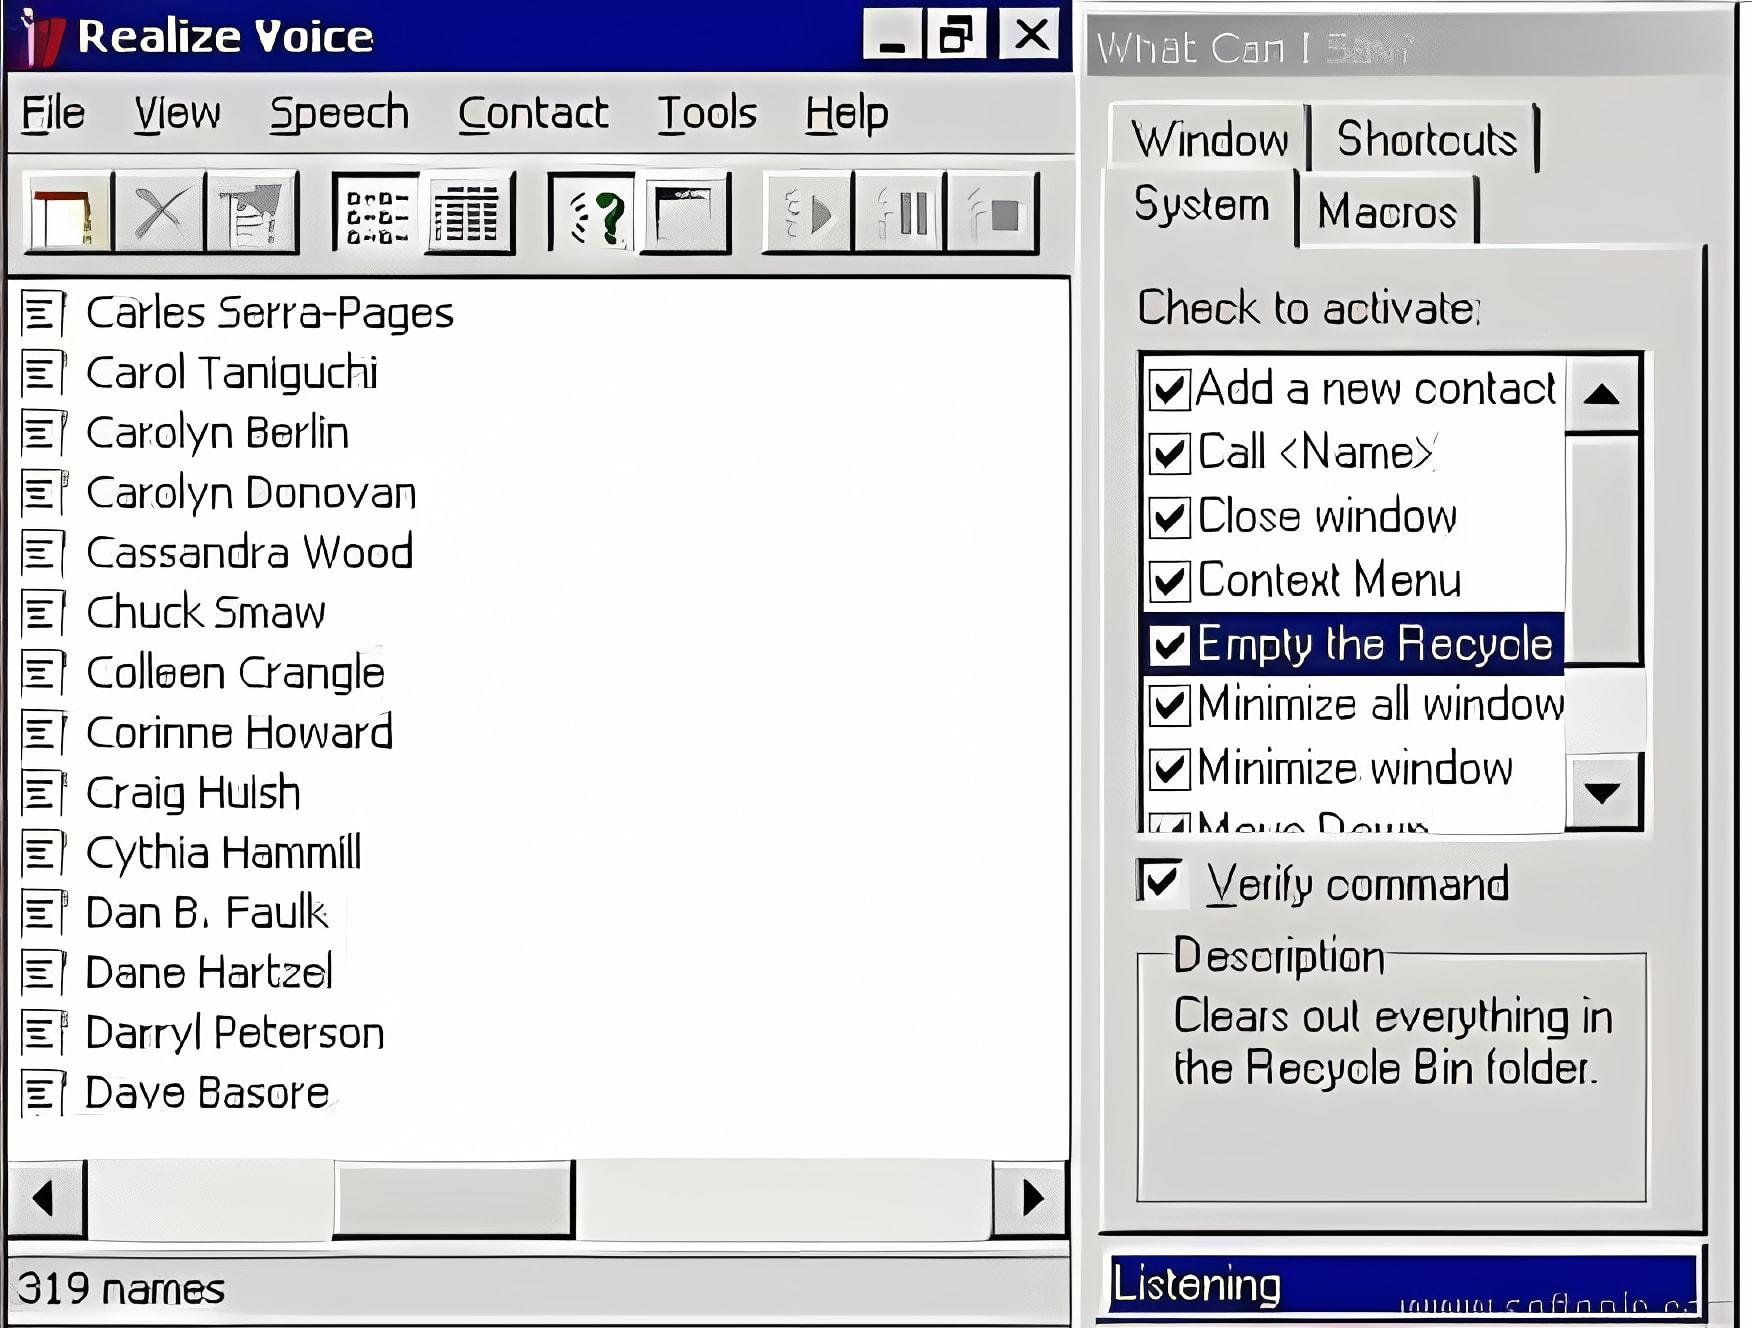 Realize Voice